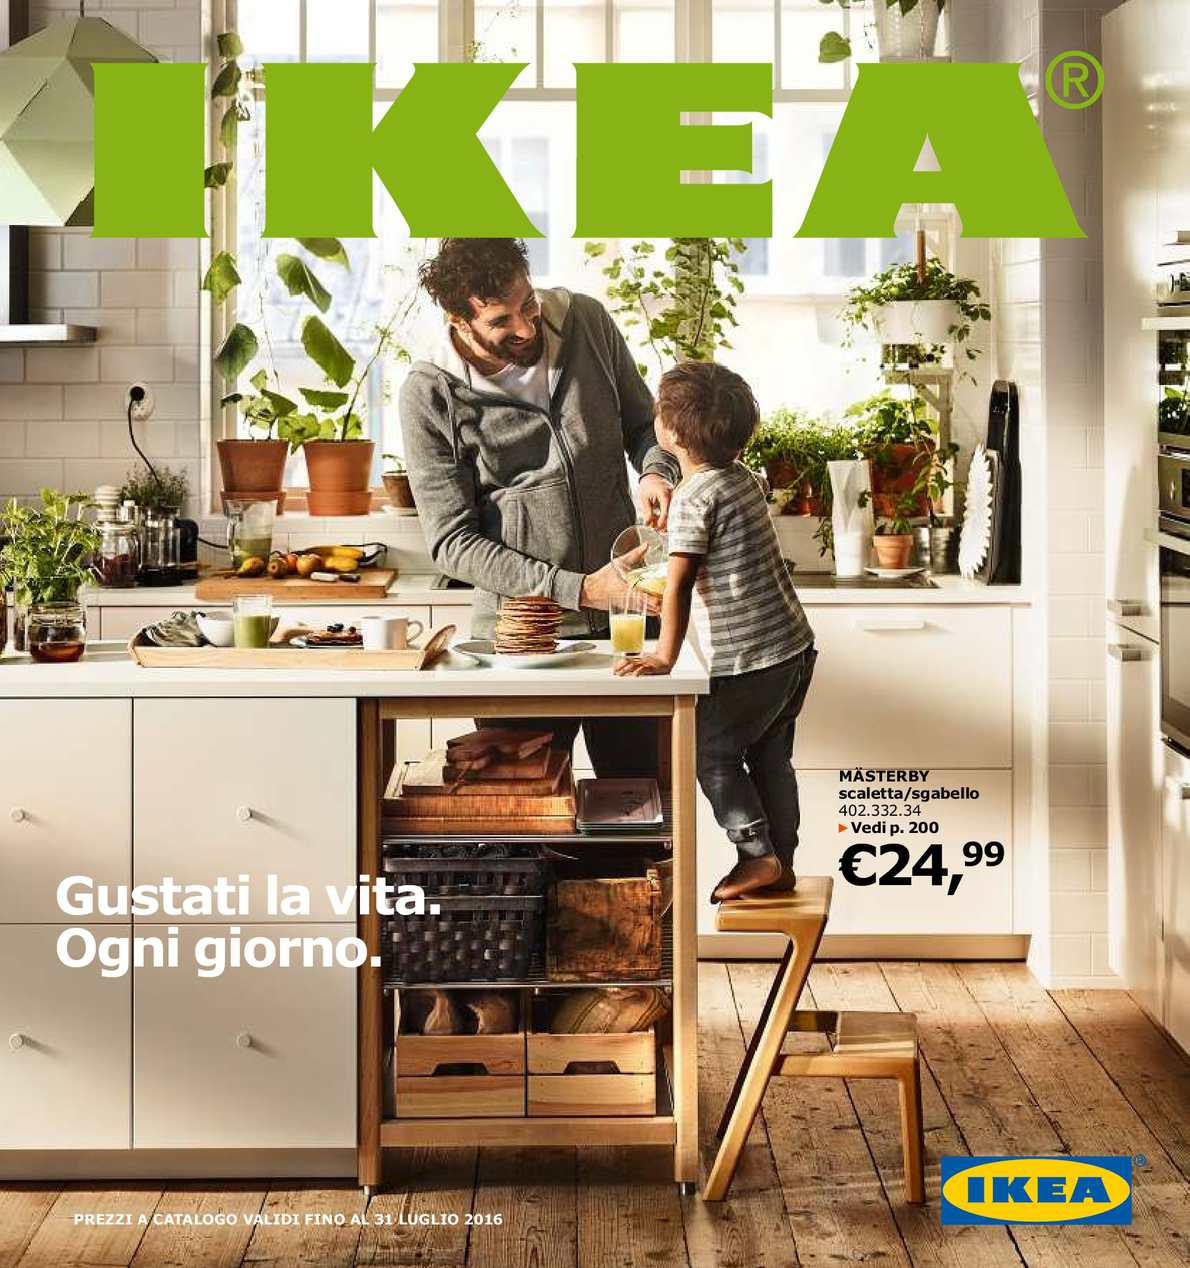 Calam o catalogo ikea fino al 31 luglio 2016 - Ikea bologna catalogo on line ...